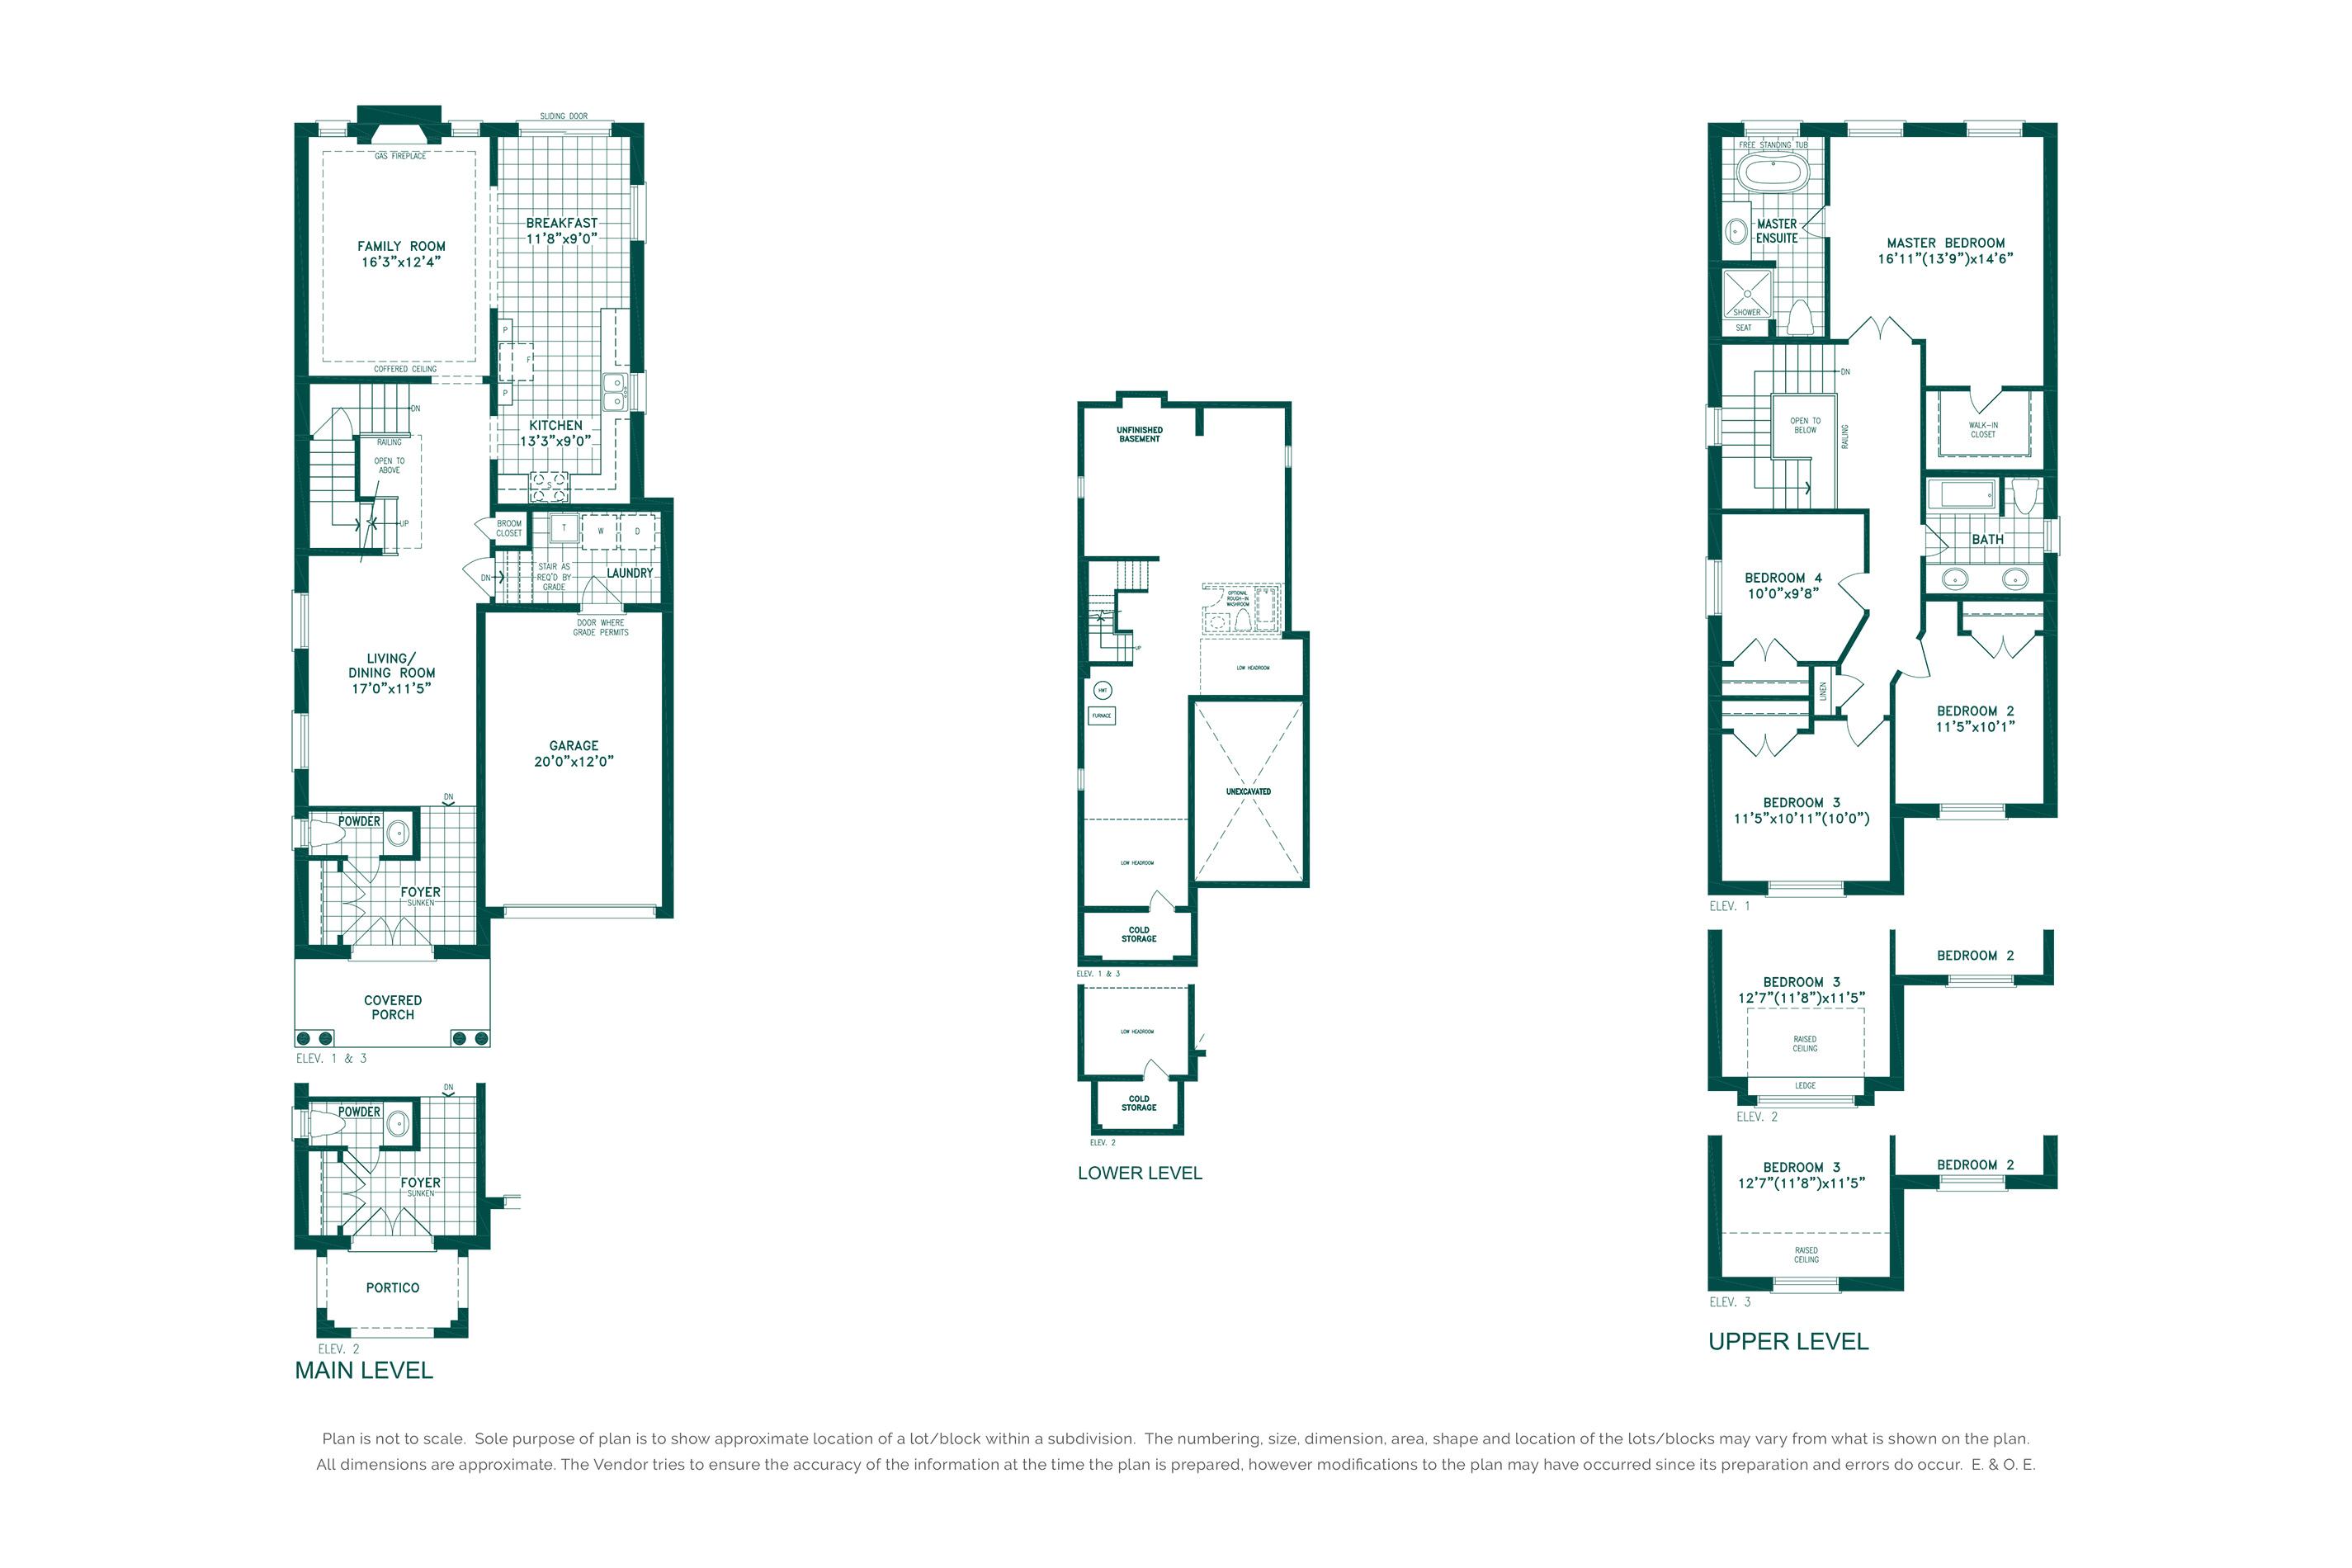 Newberry 2A Floorplan